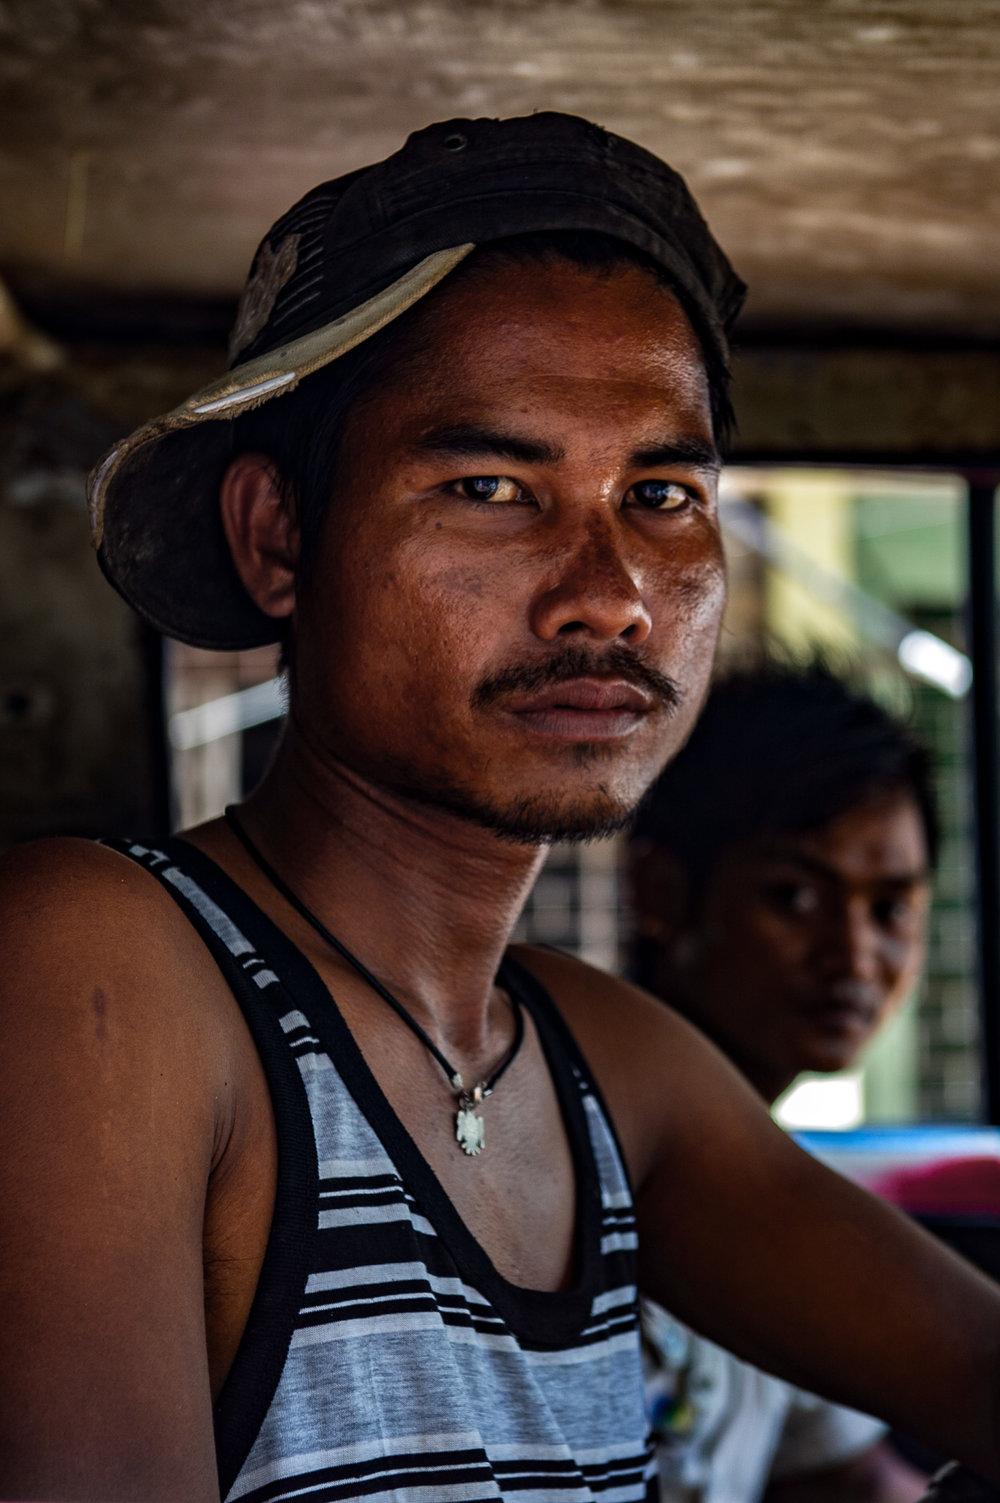 Truck driver. Yangon,Myanmar.